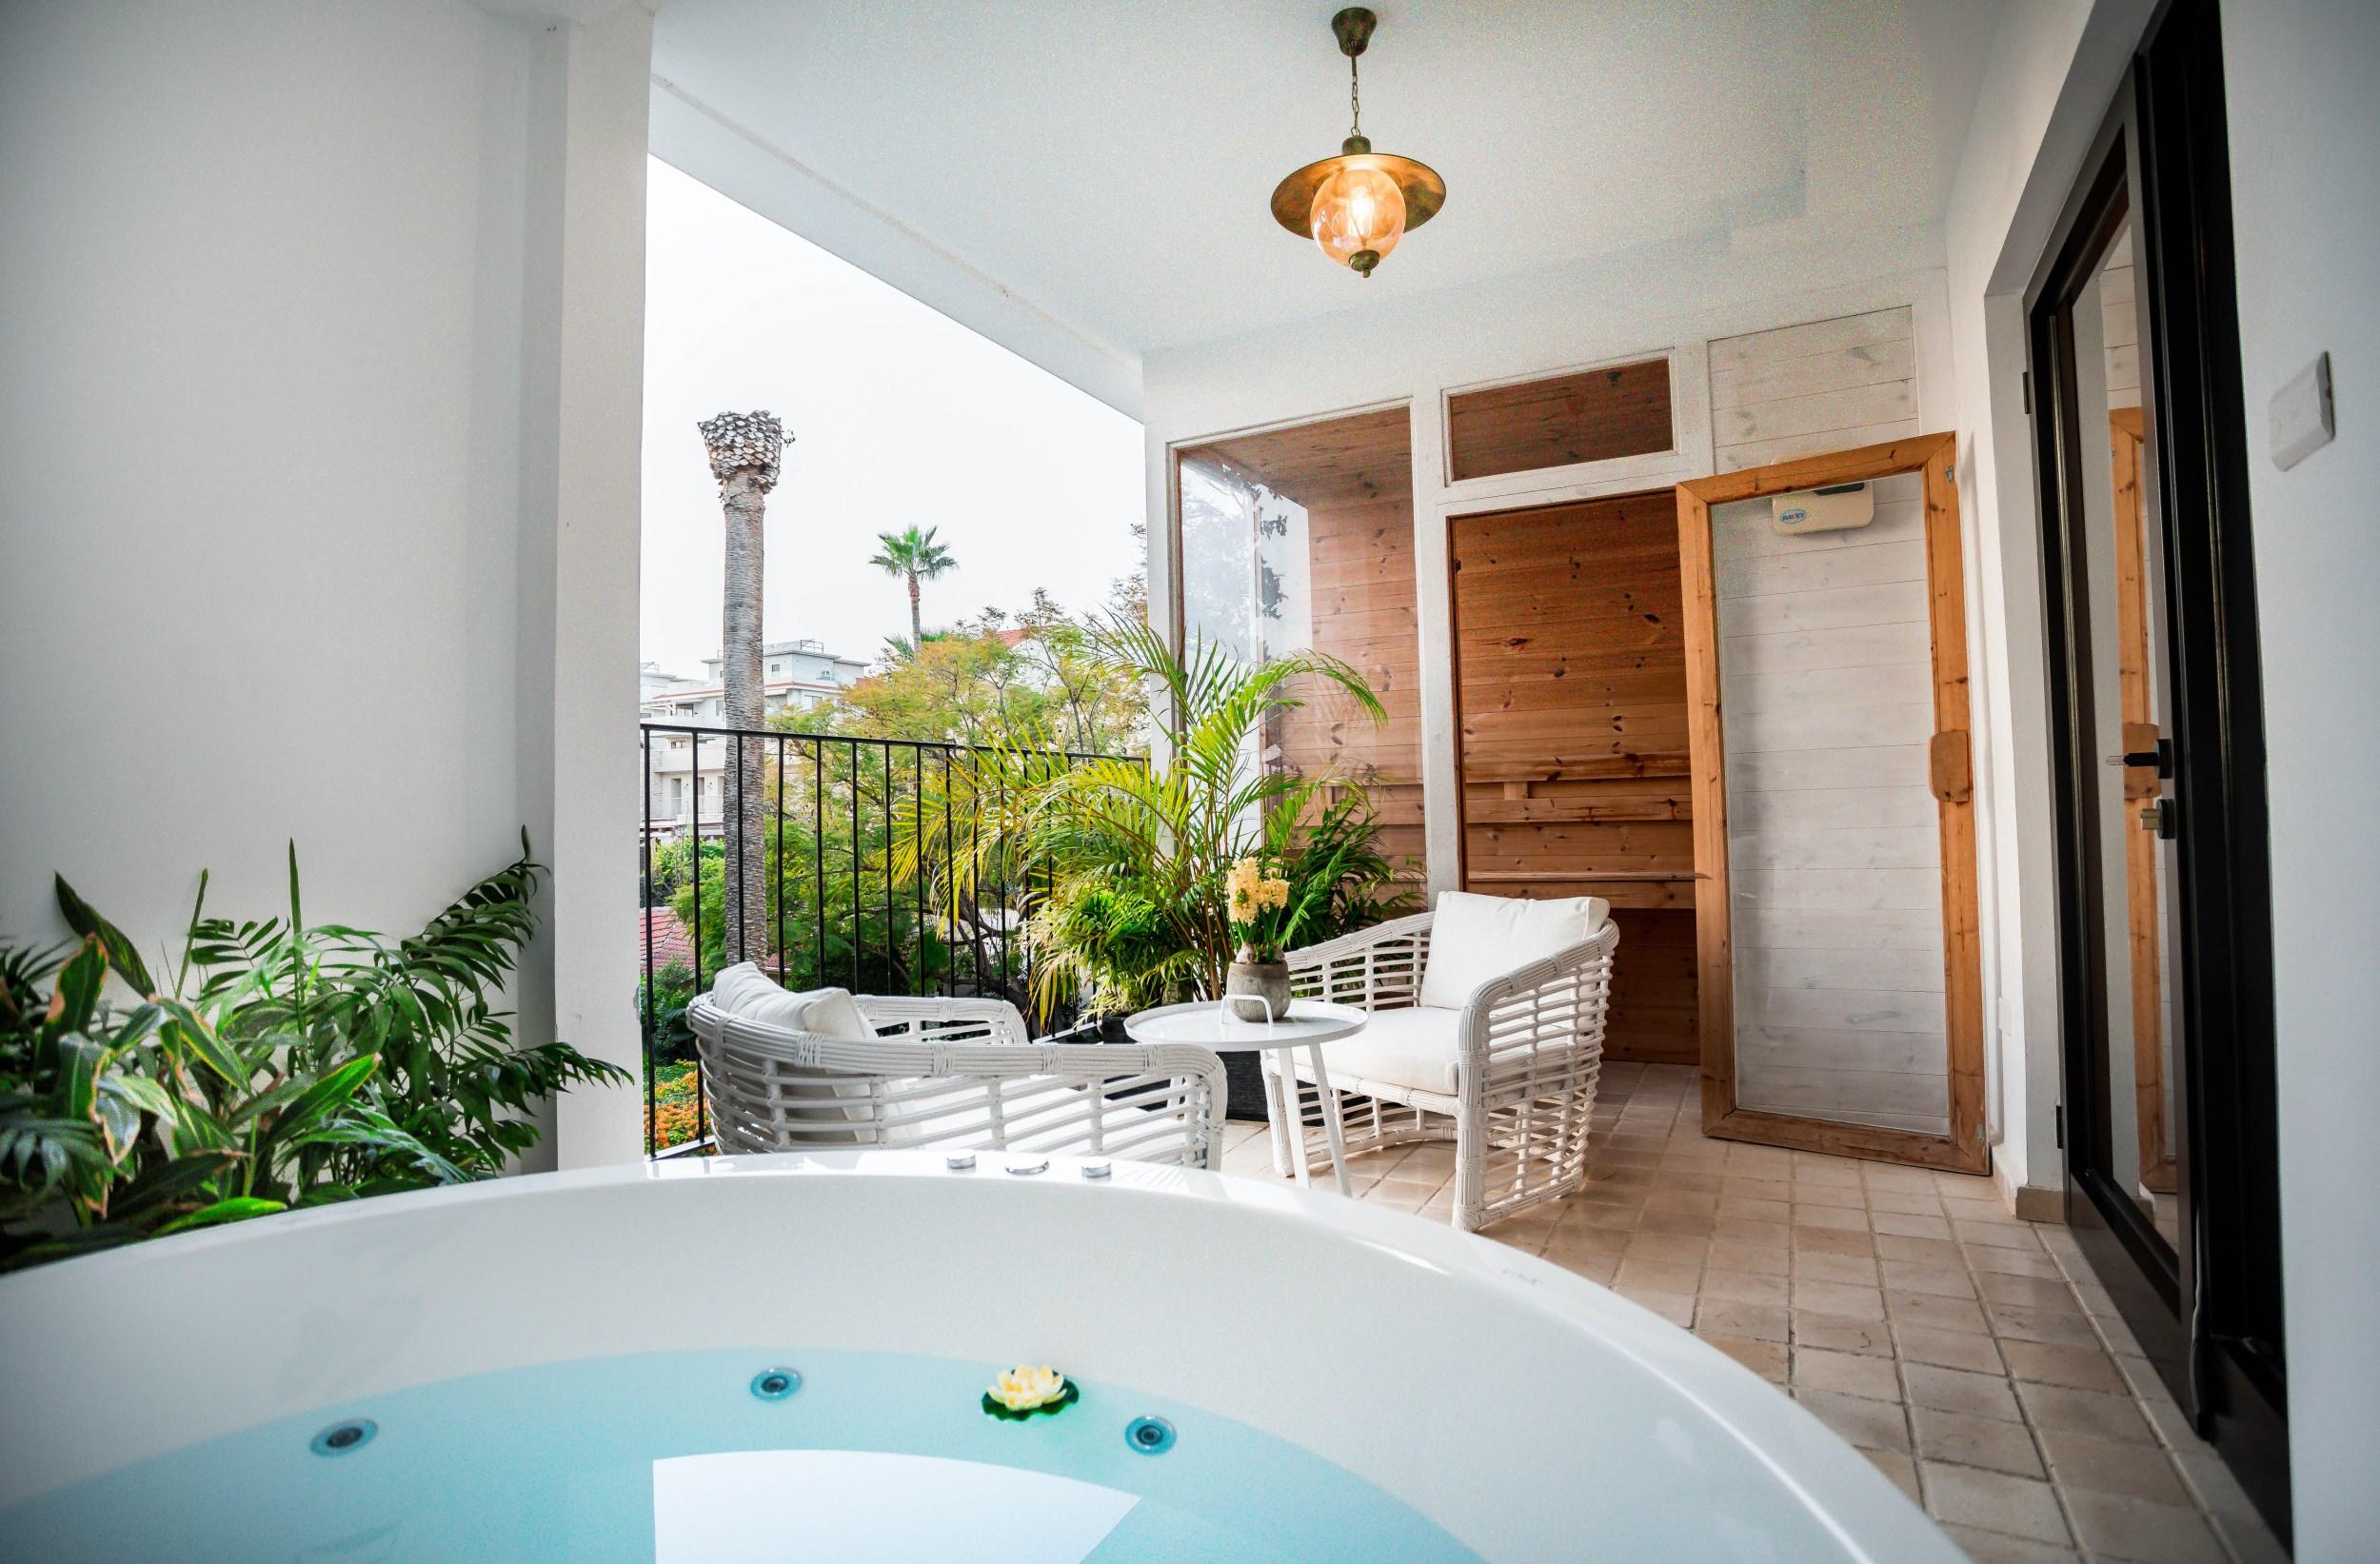 Hotel Lear - Loft Jacuzzi